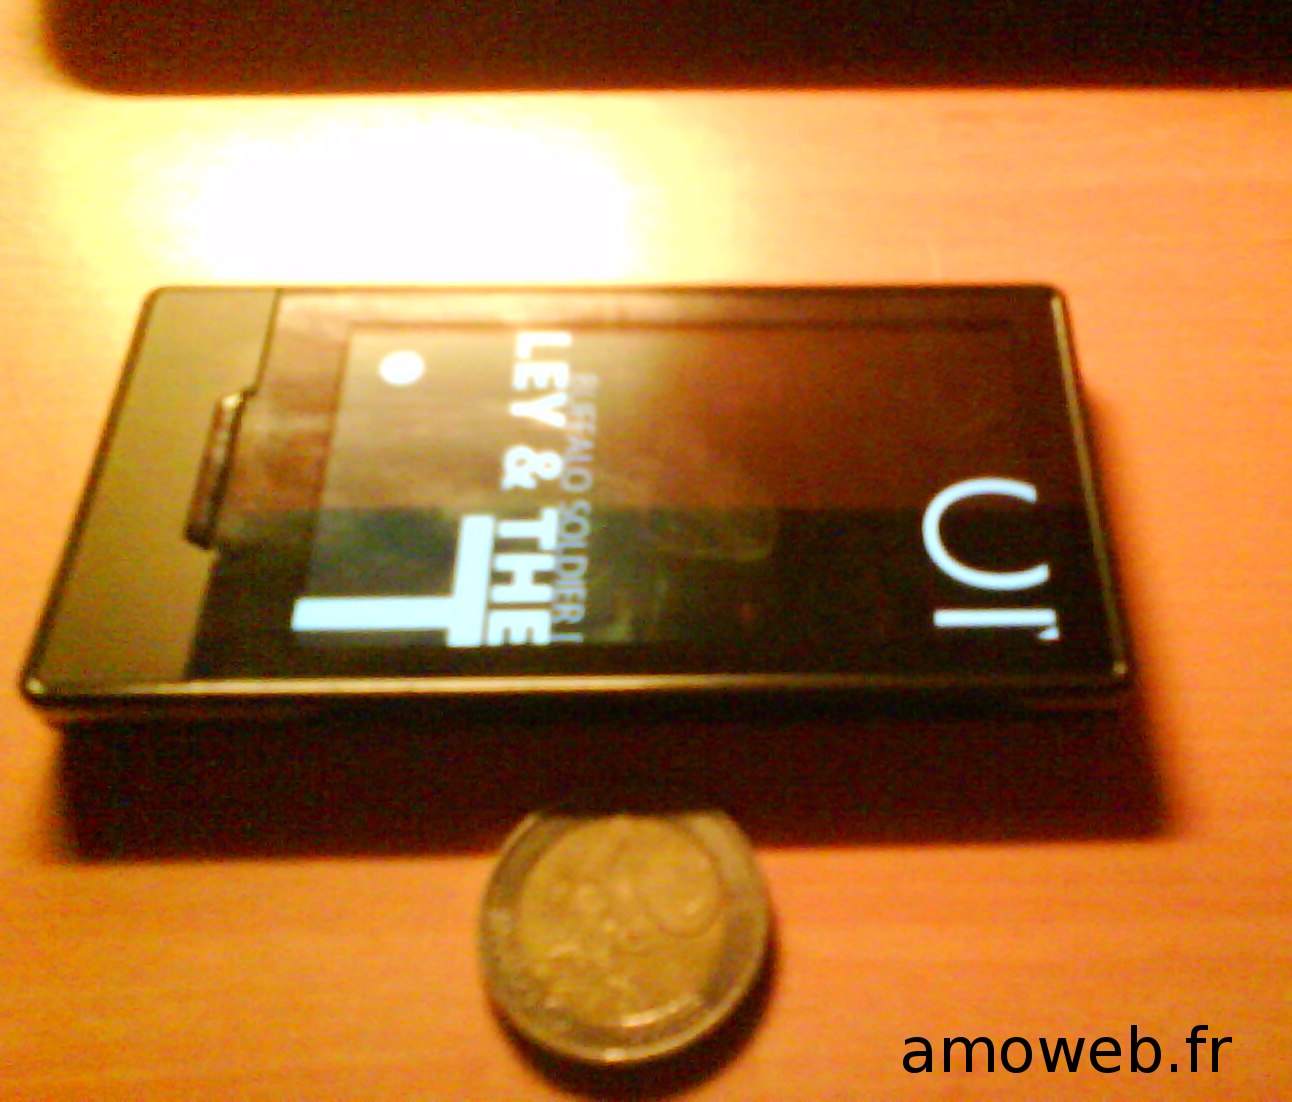 Zune HD vue petite taille pièce 2€